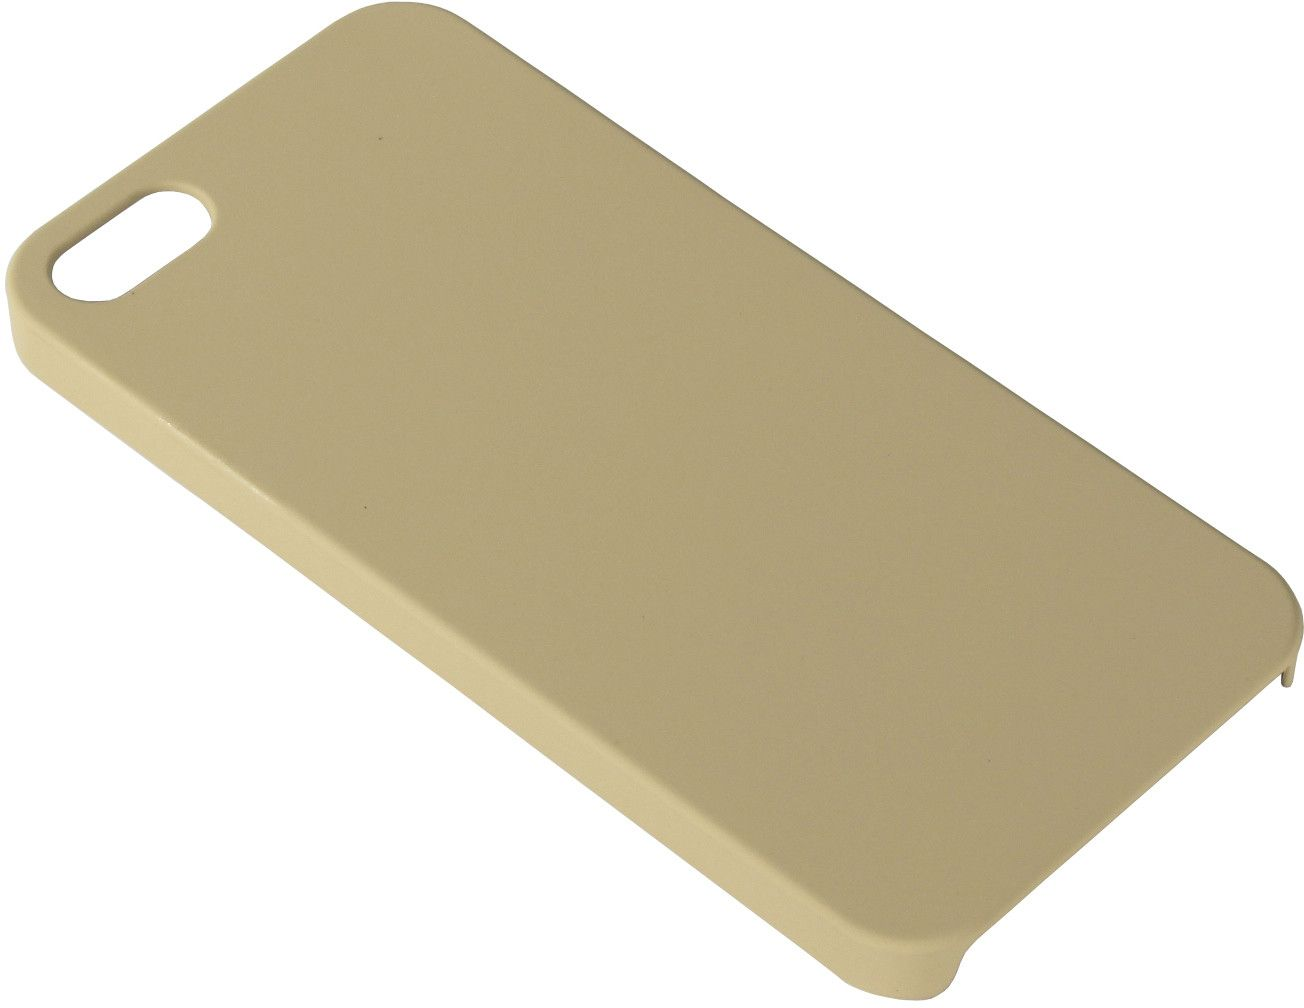 Gear Hard Case (iPhone 5/5S/SE) – Beige